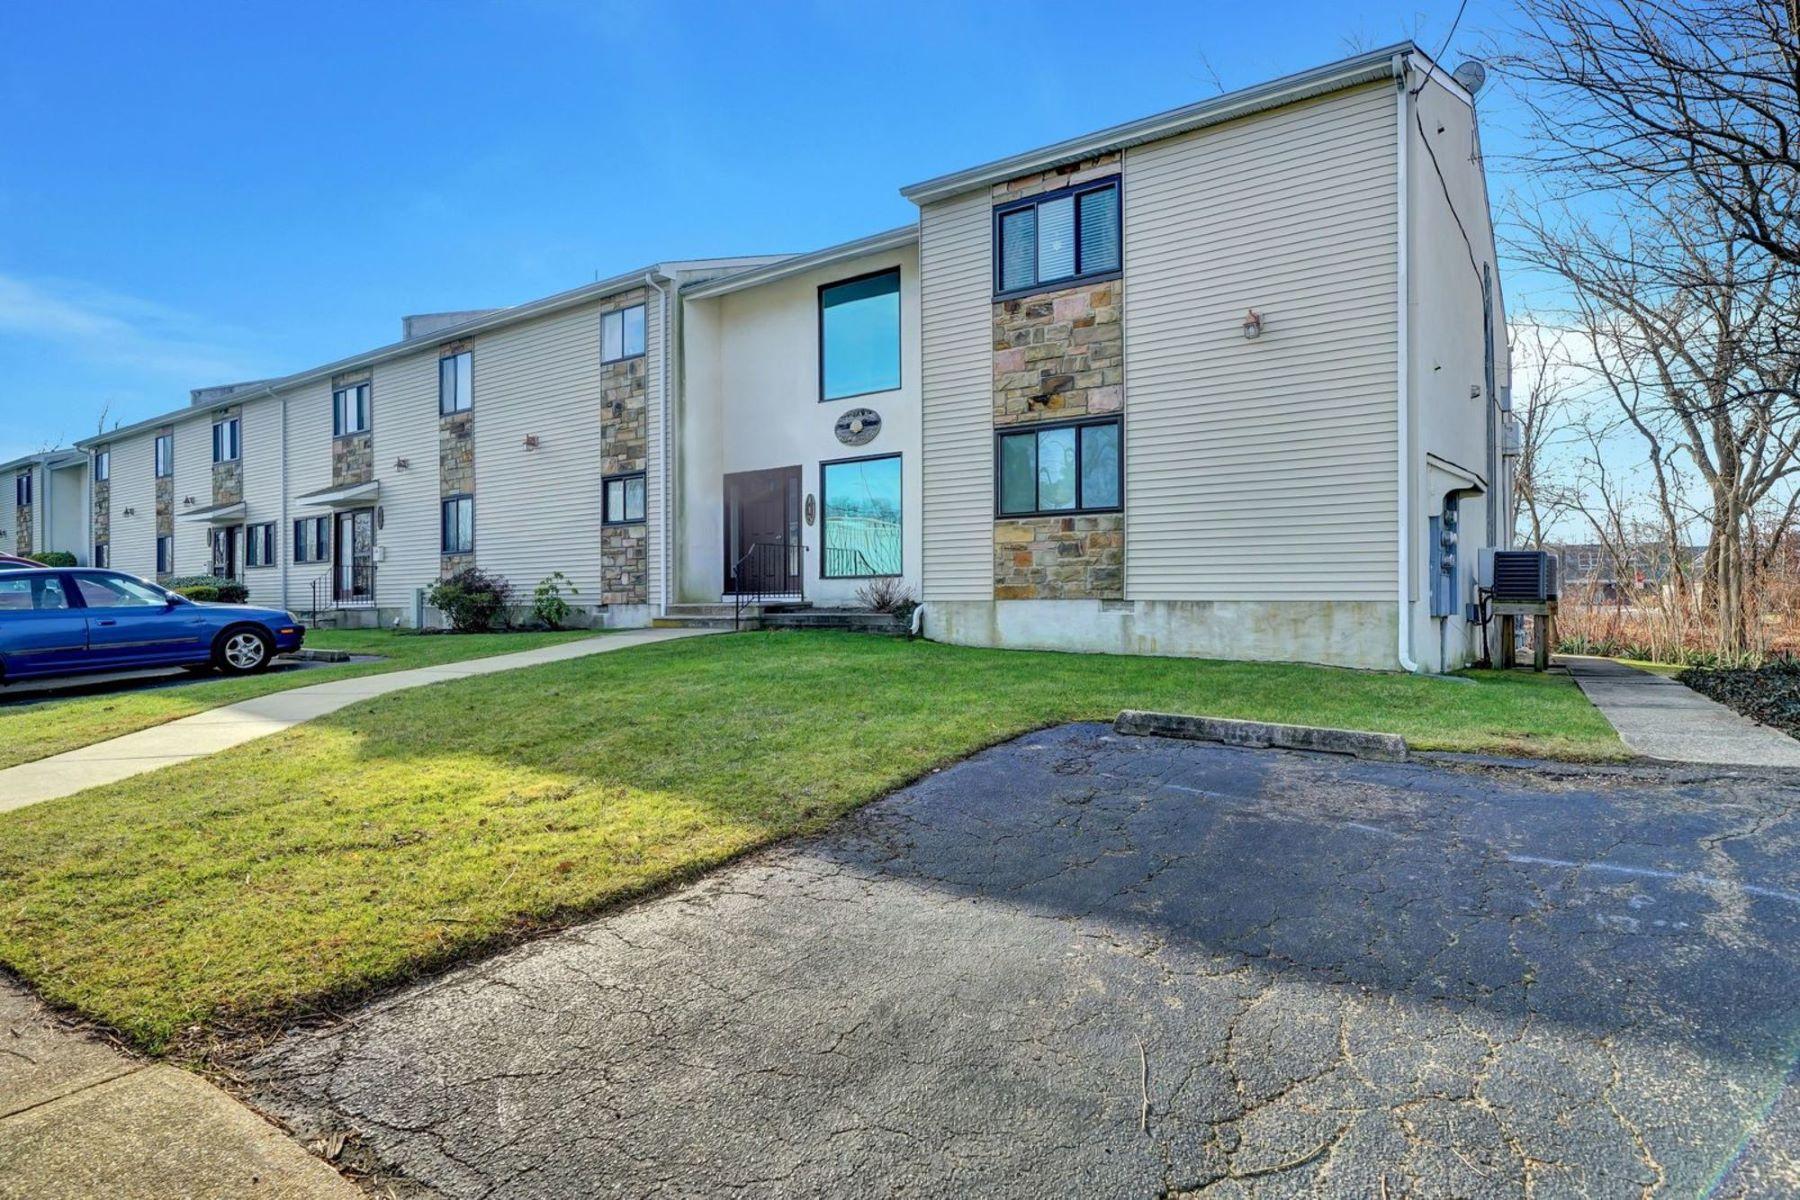 Condominiums για την Πώληση στο Charming Condo in Downtown Manasquan 115-1 Curtis, Manasquan, Νιου Τζερσεϋ 08736 Ηνωμένες Πολιτείες